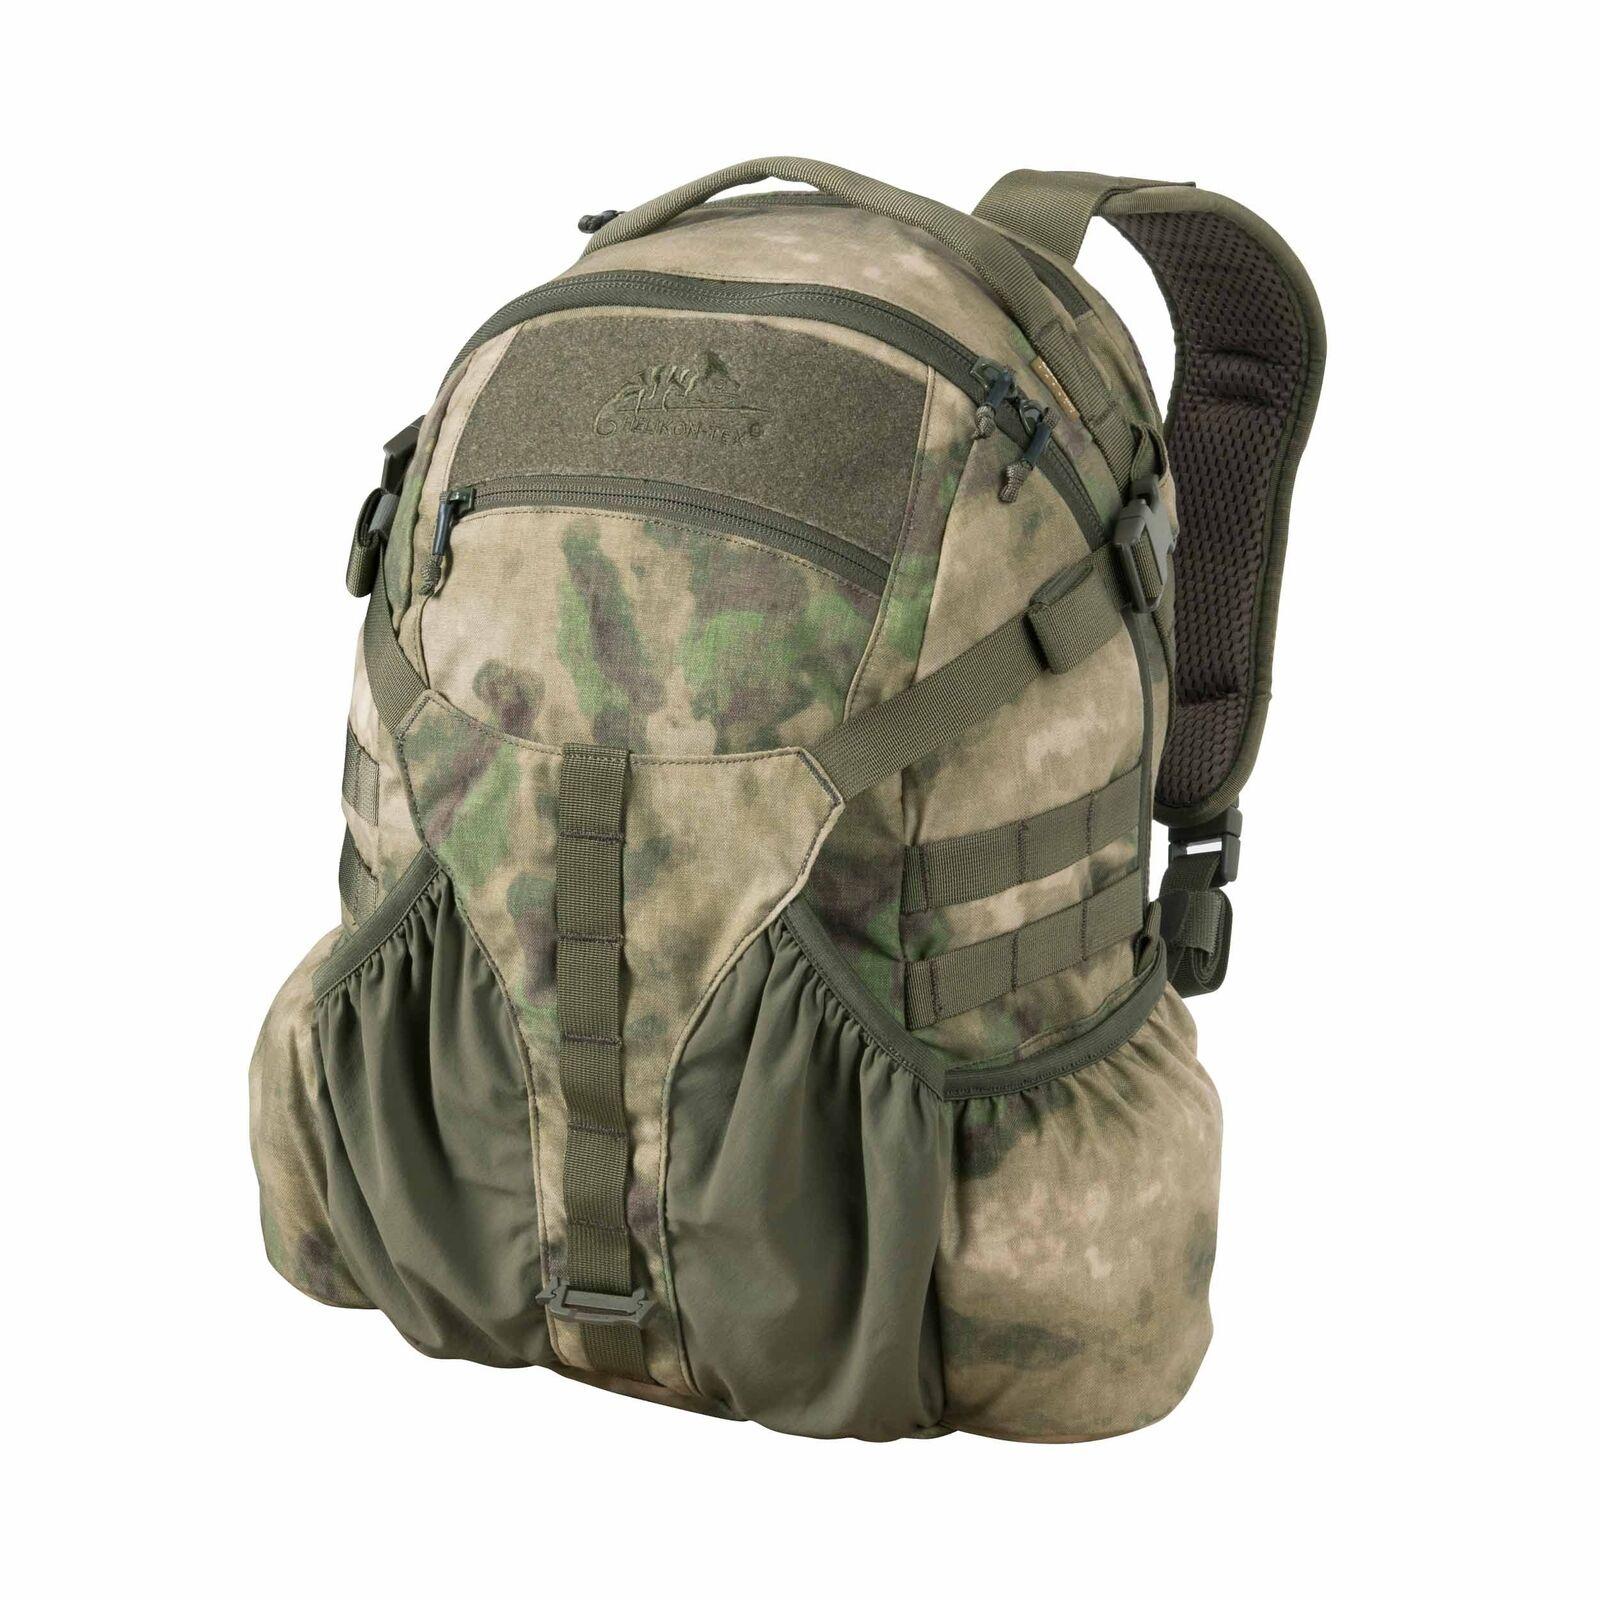 Helikon-Tex Raider Rucksack Rucksack Rucksack A-TAGS FG Backpack 20 Liter d2cb15